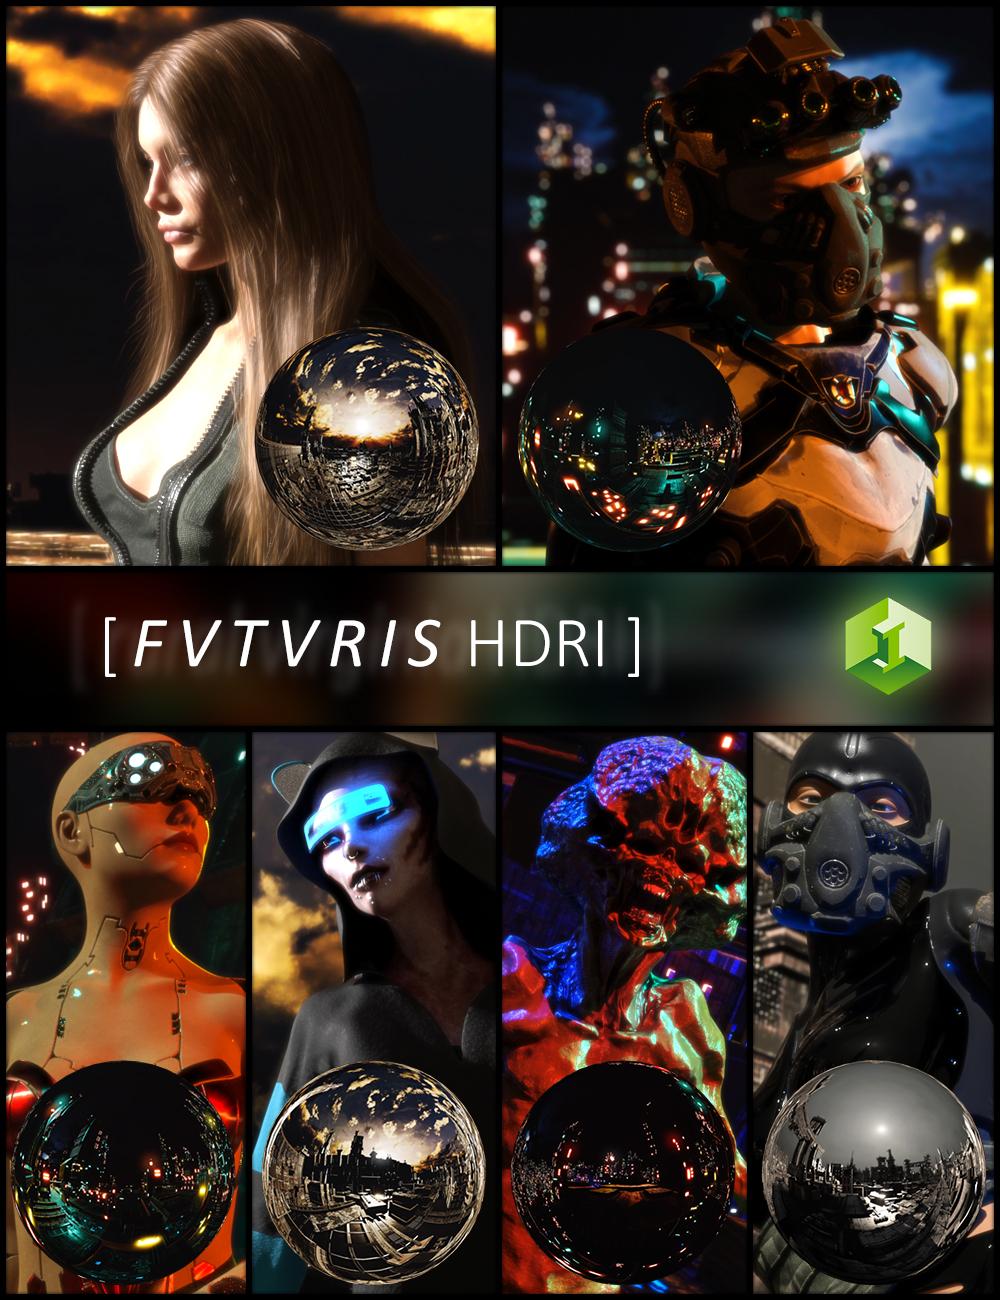 Fvtvris HDRI by: JDA HDRI, 3D Models by Daz 3D